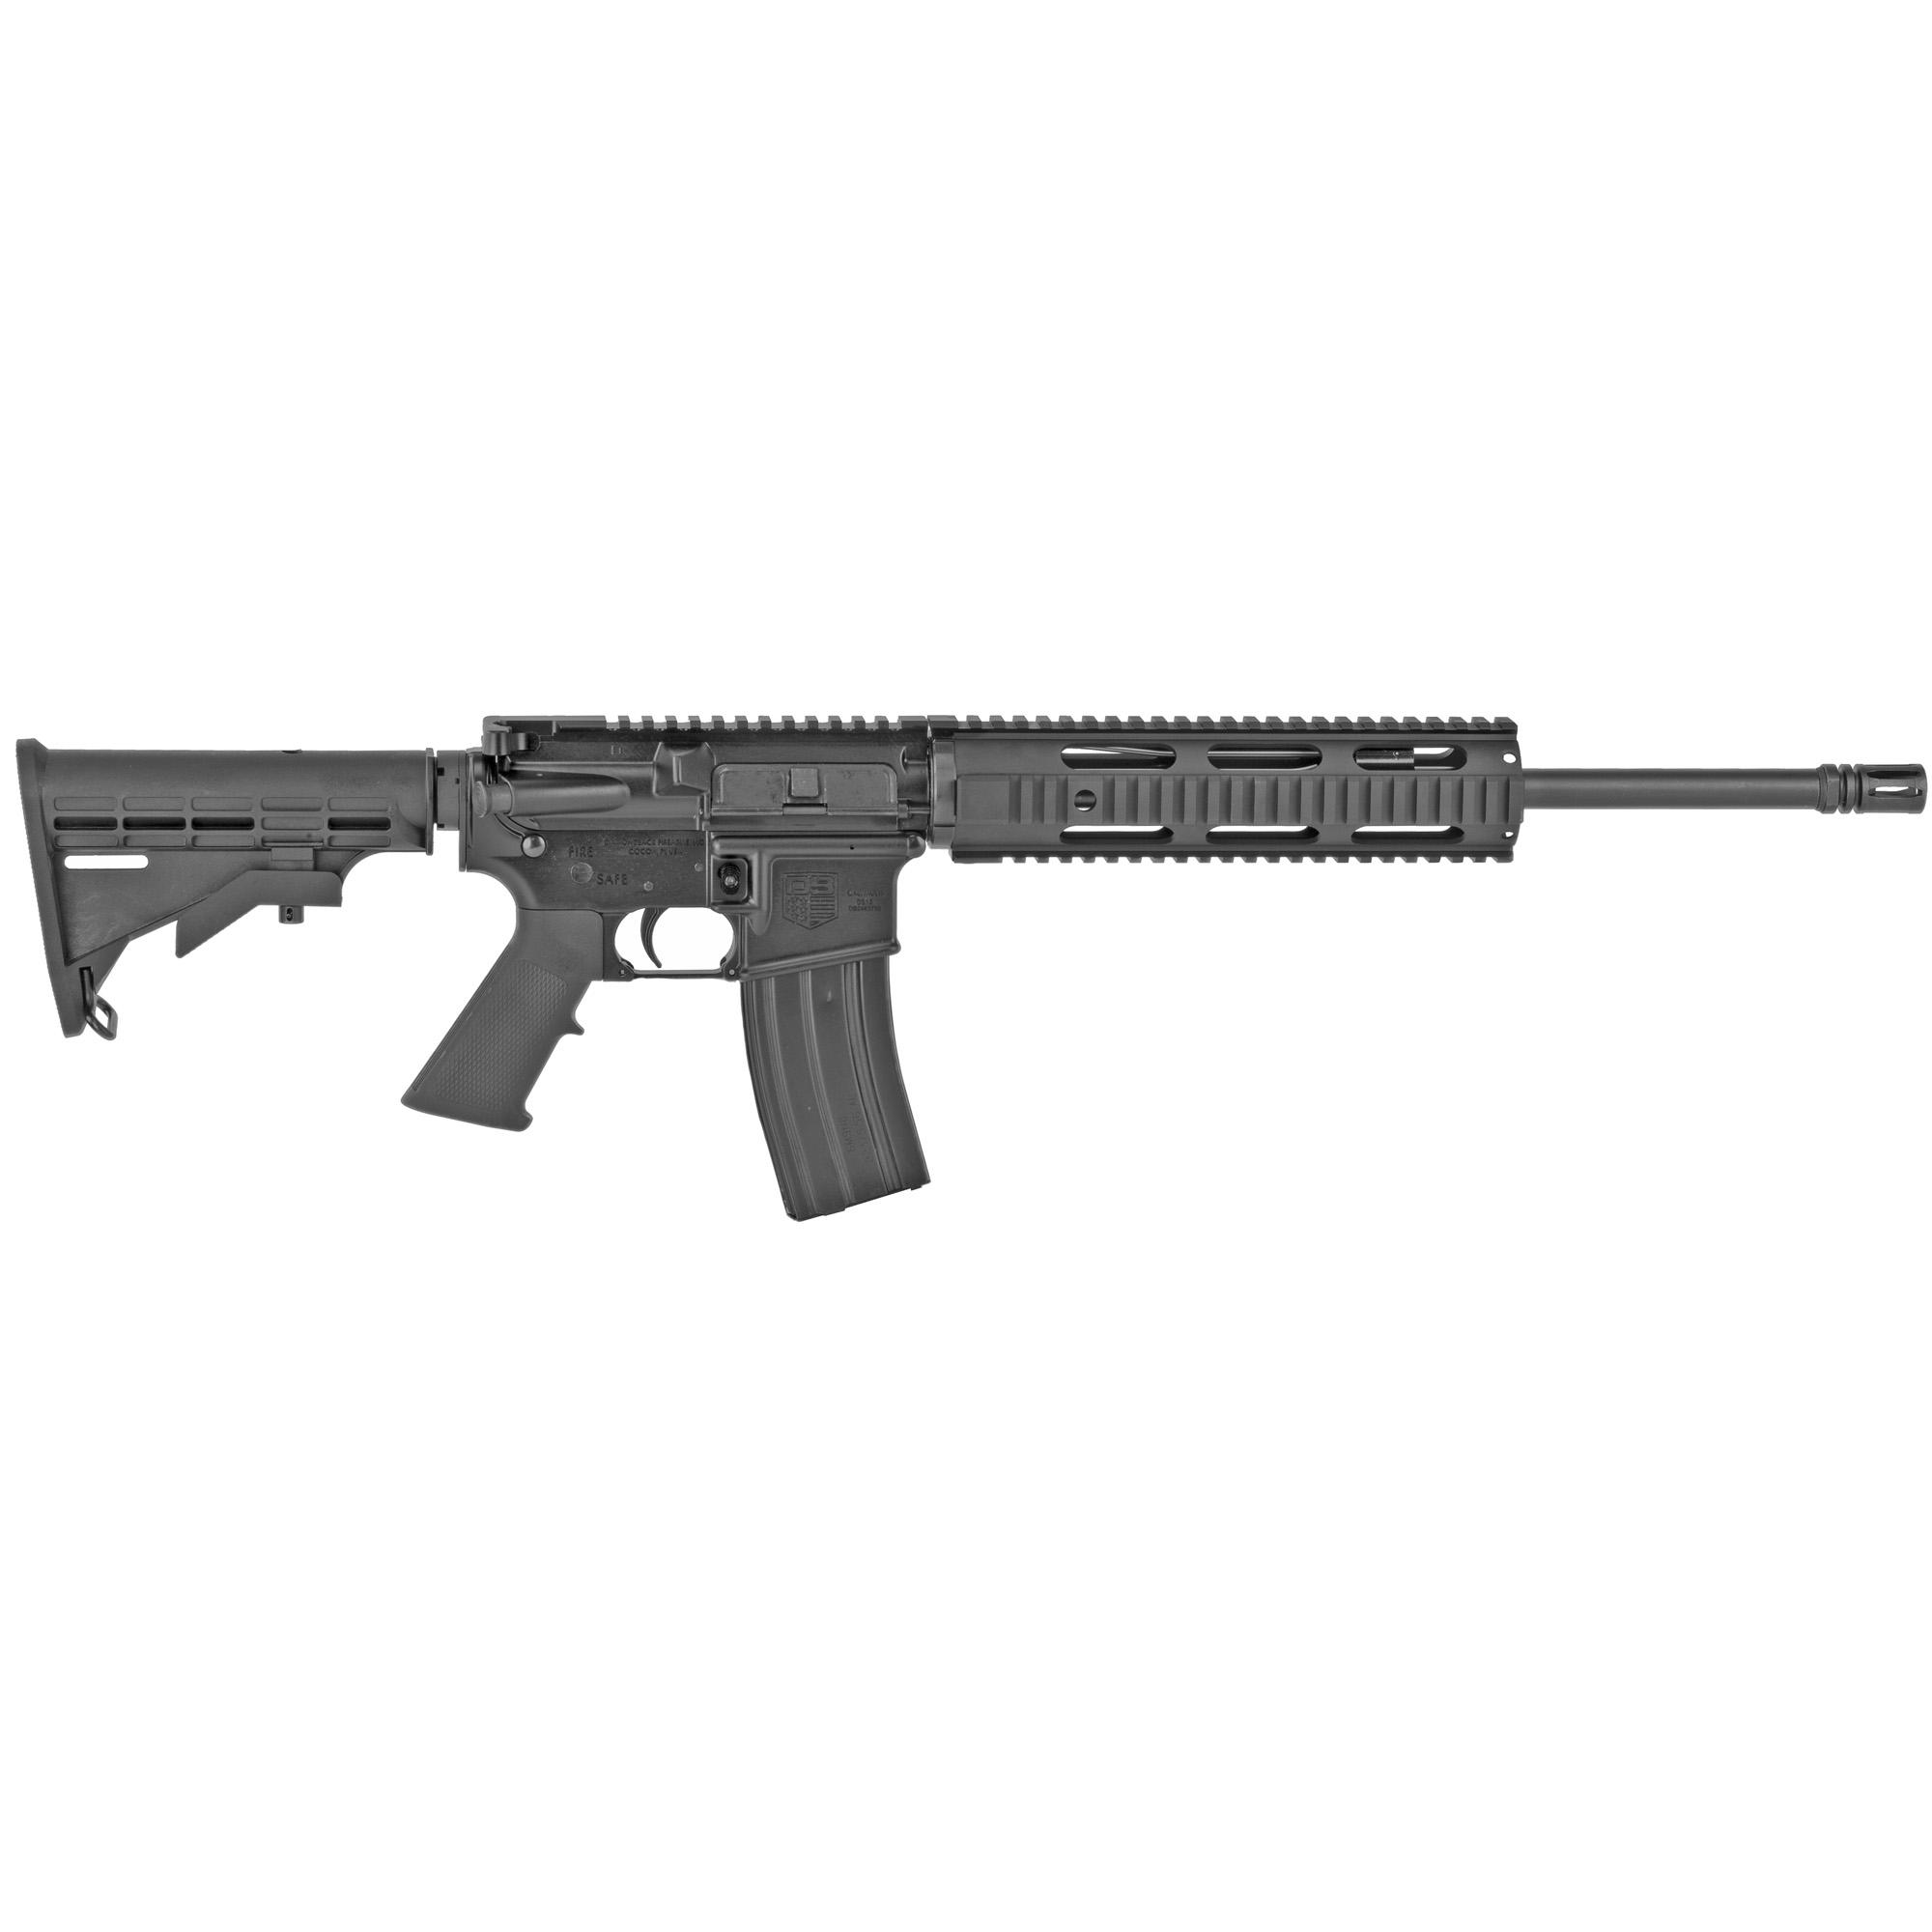 Diamondback DB15CCBV2 DB15 5.56x45mm NATO 16